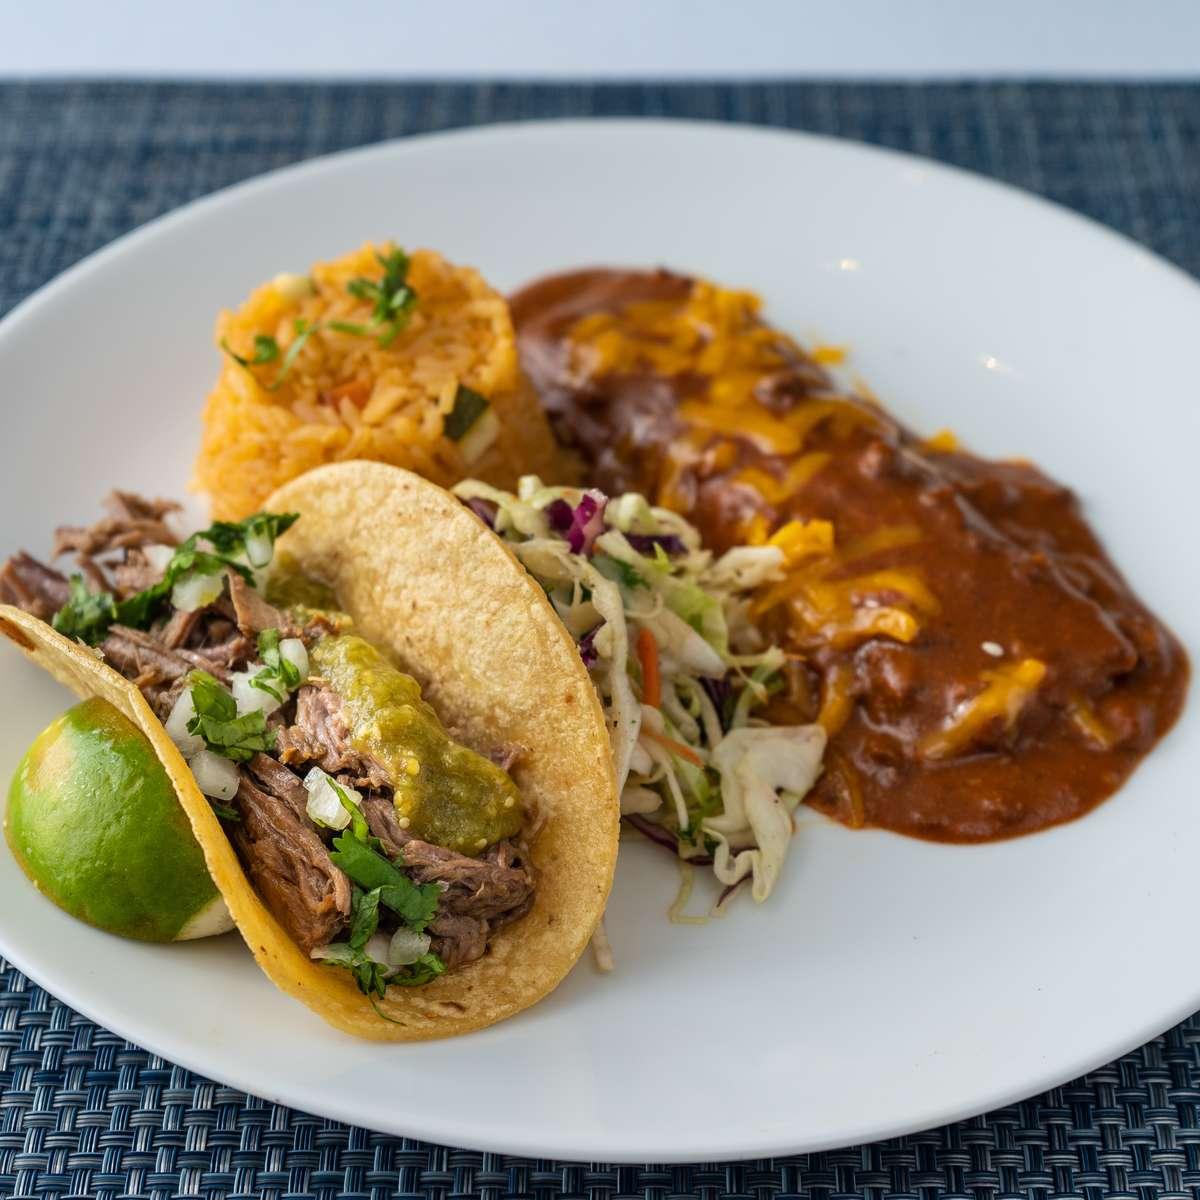 5. tejano enchilada, brisket taco, mesero slaw, arroz rojo